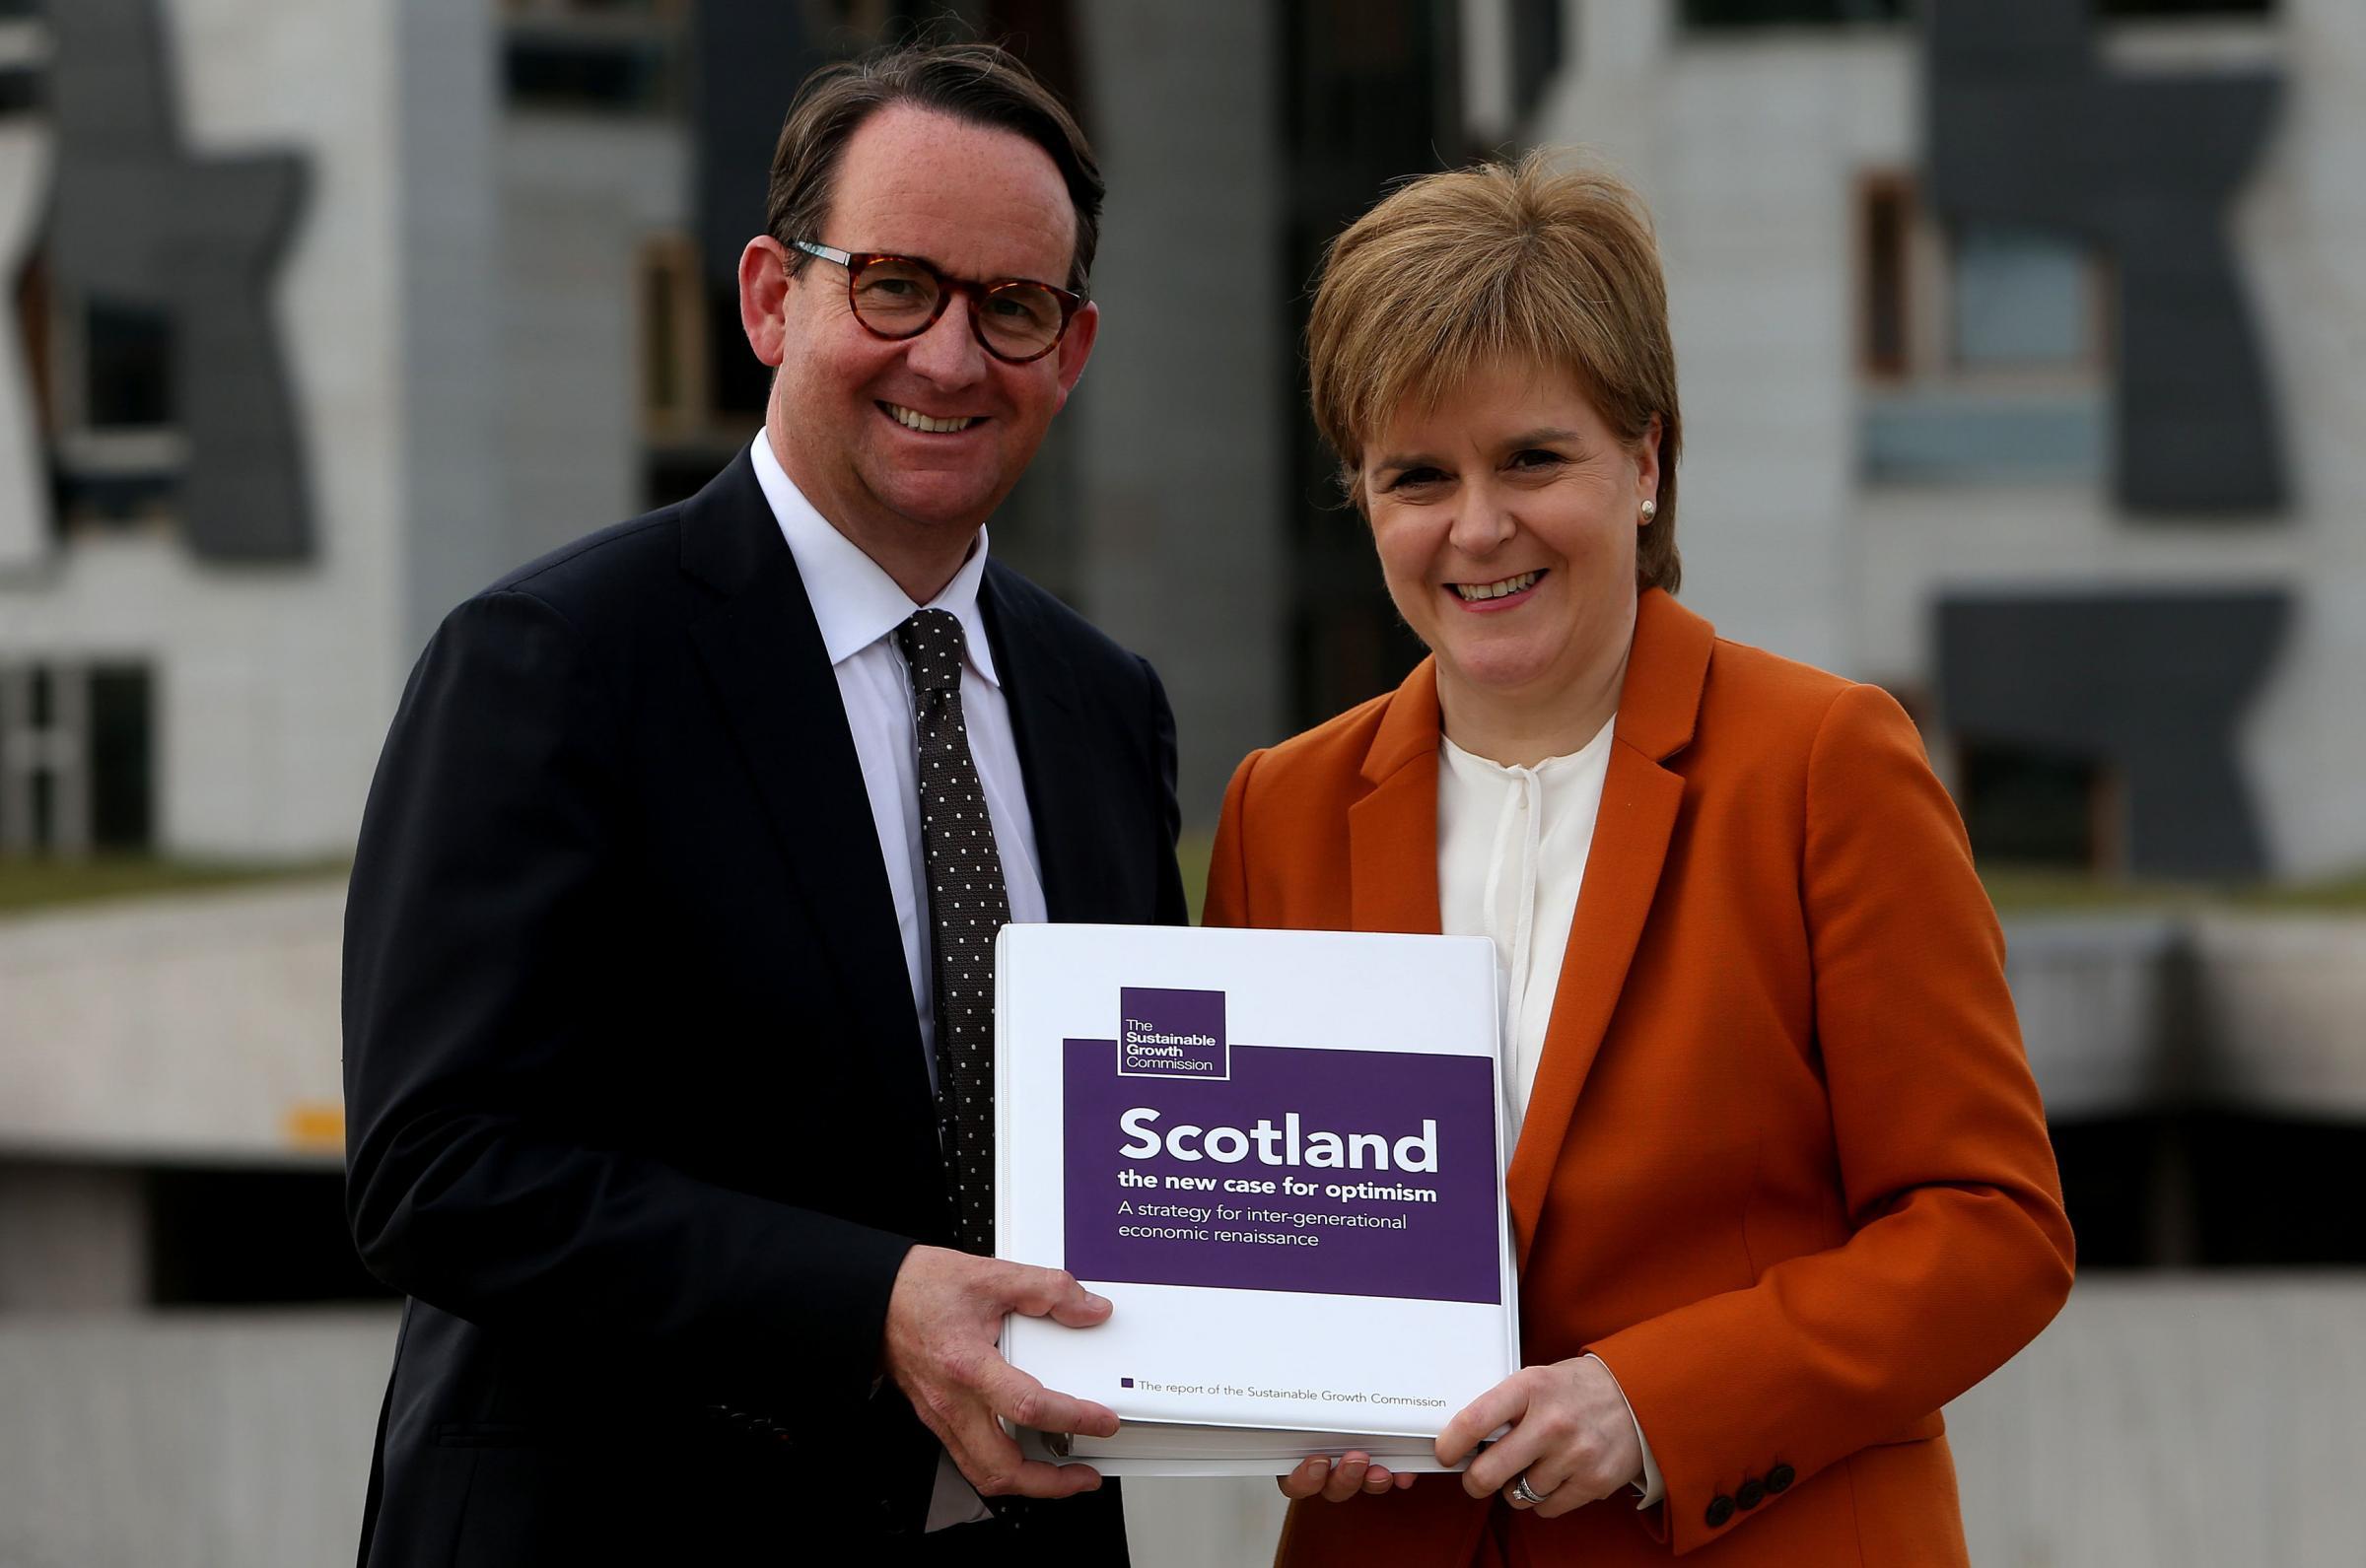 Nicola Sturgeon acknowledges Yes still lacks winning case